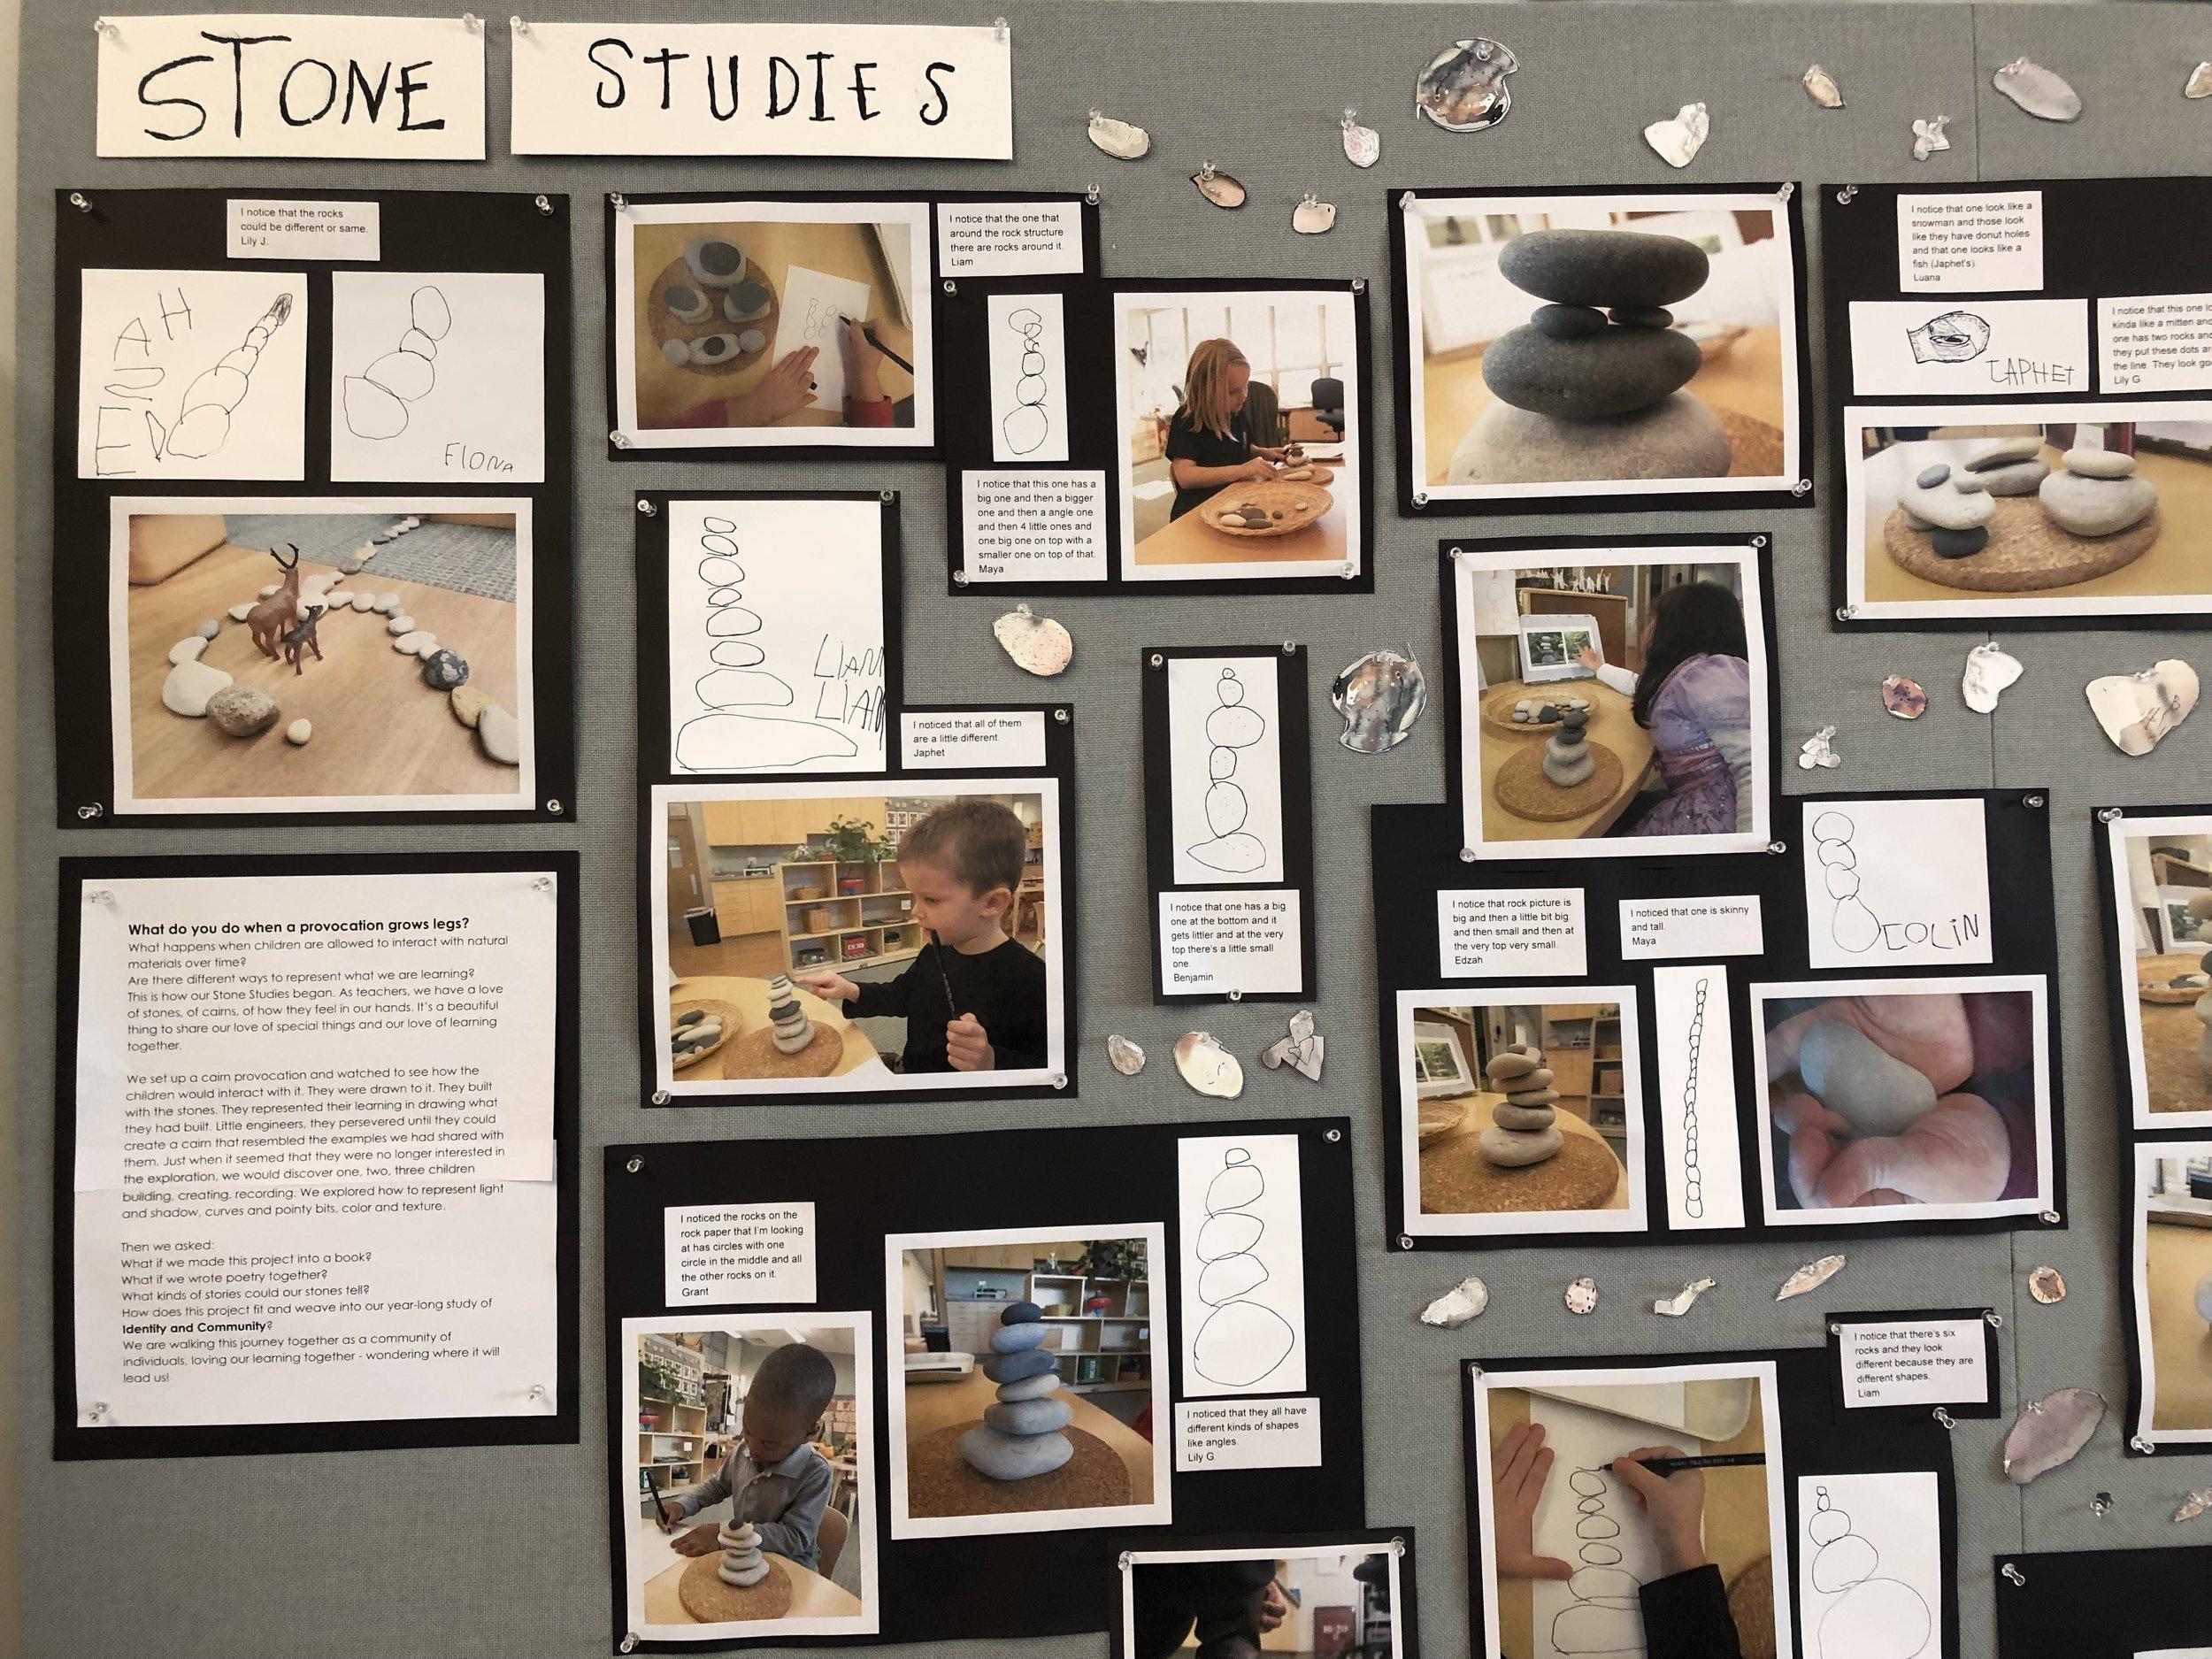 Stone Study Documentation, Rachel and Sue's classroom, April, 2019